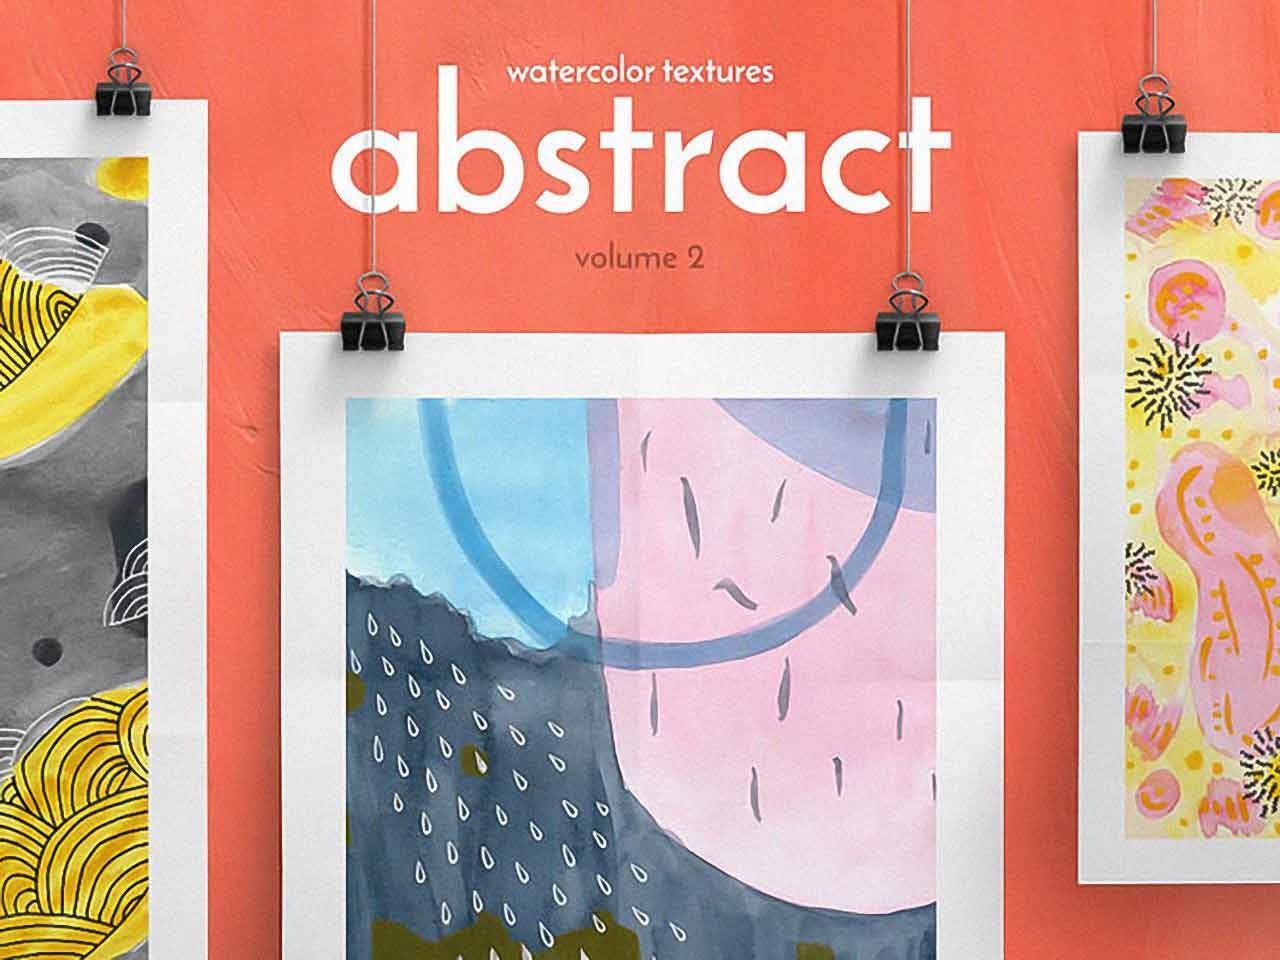 Abstract Watercolor Textures vol. 2